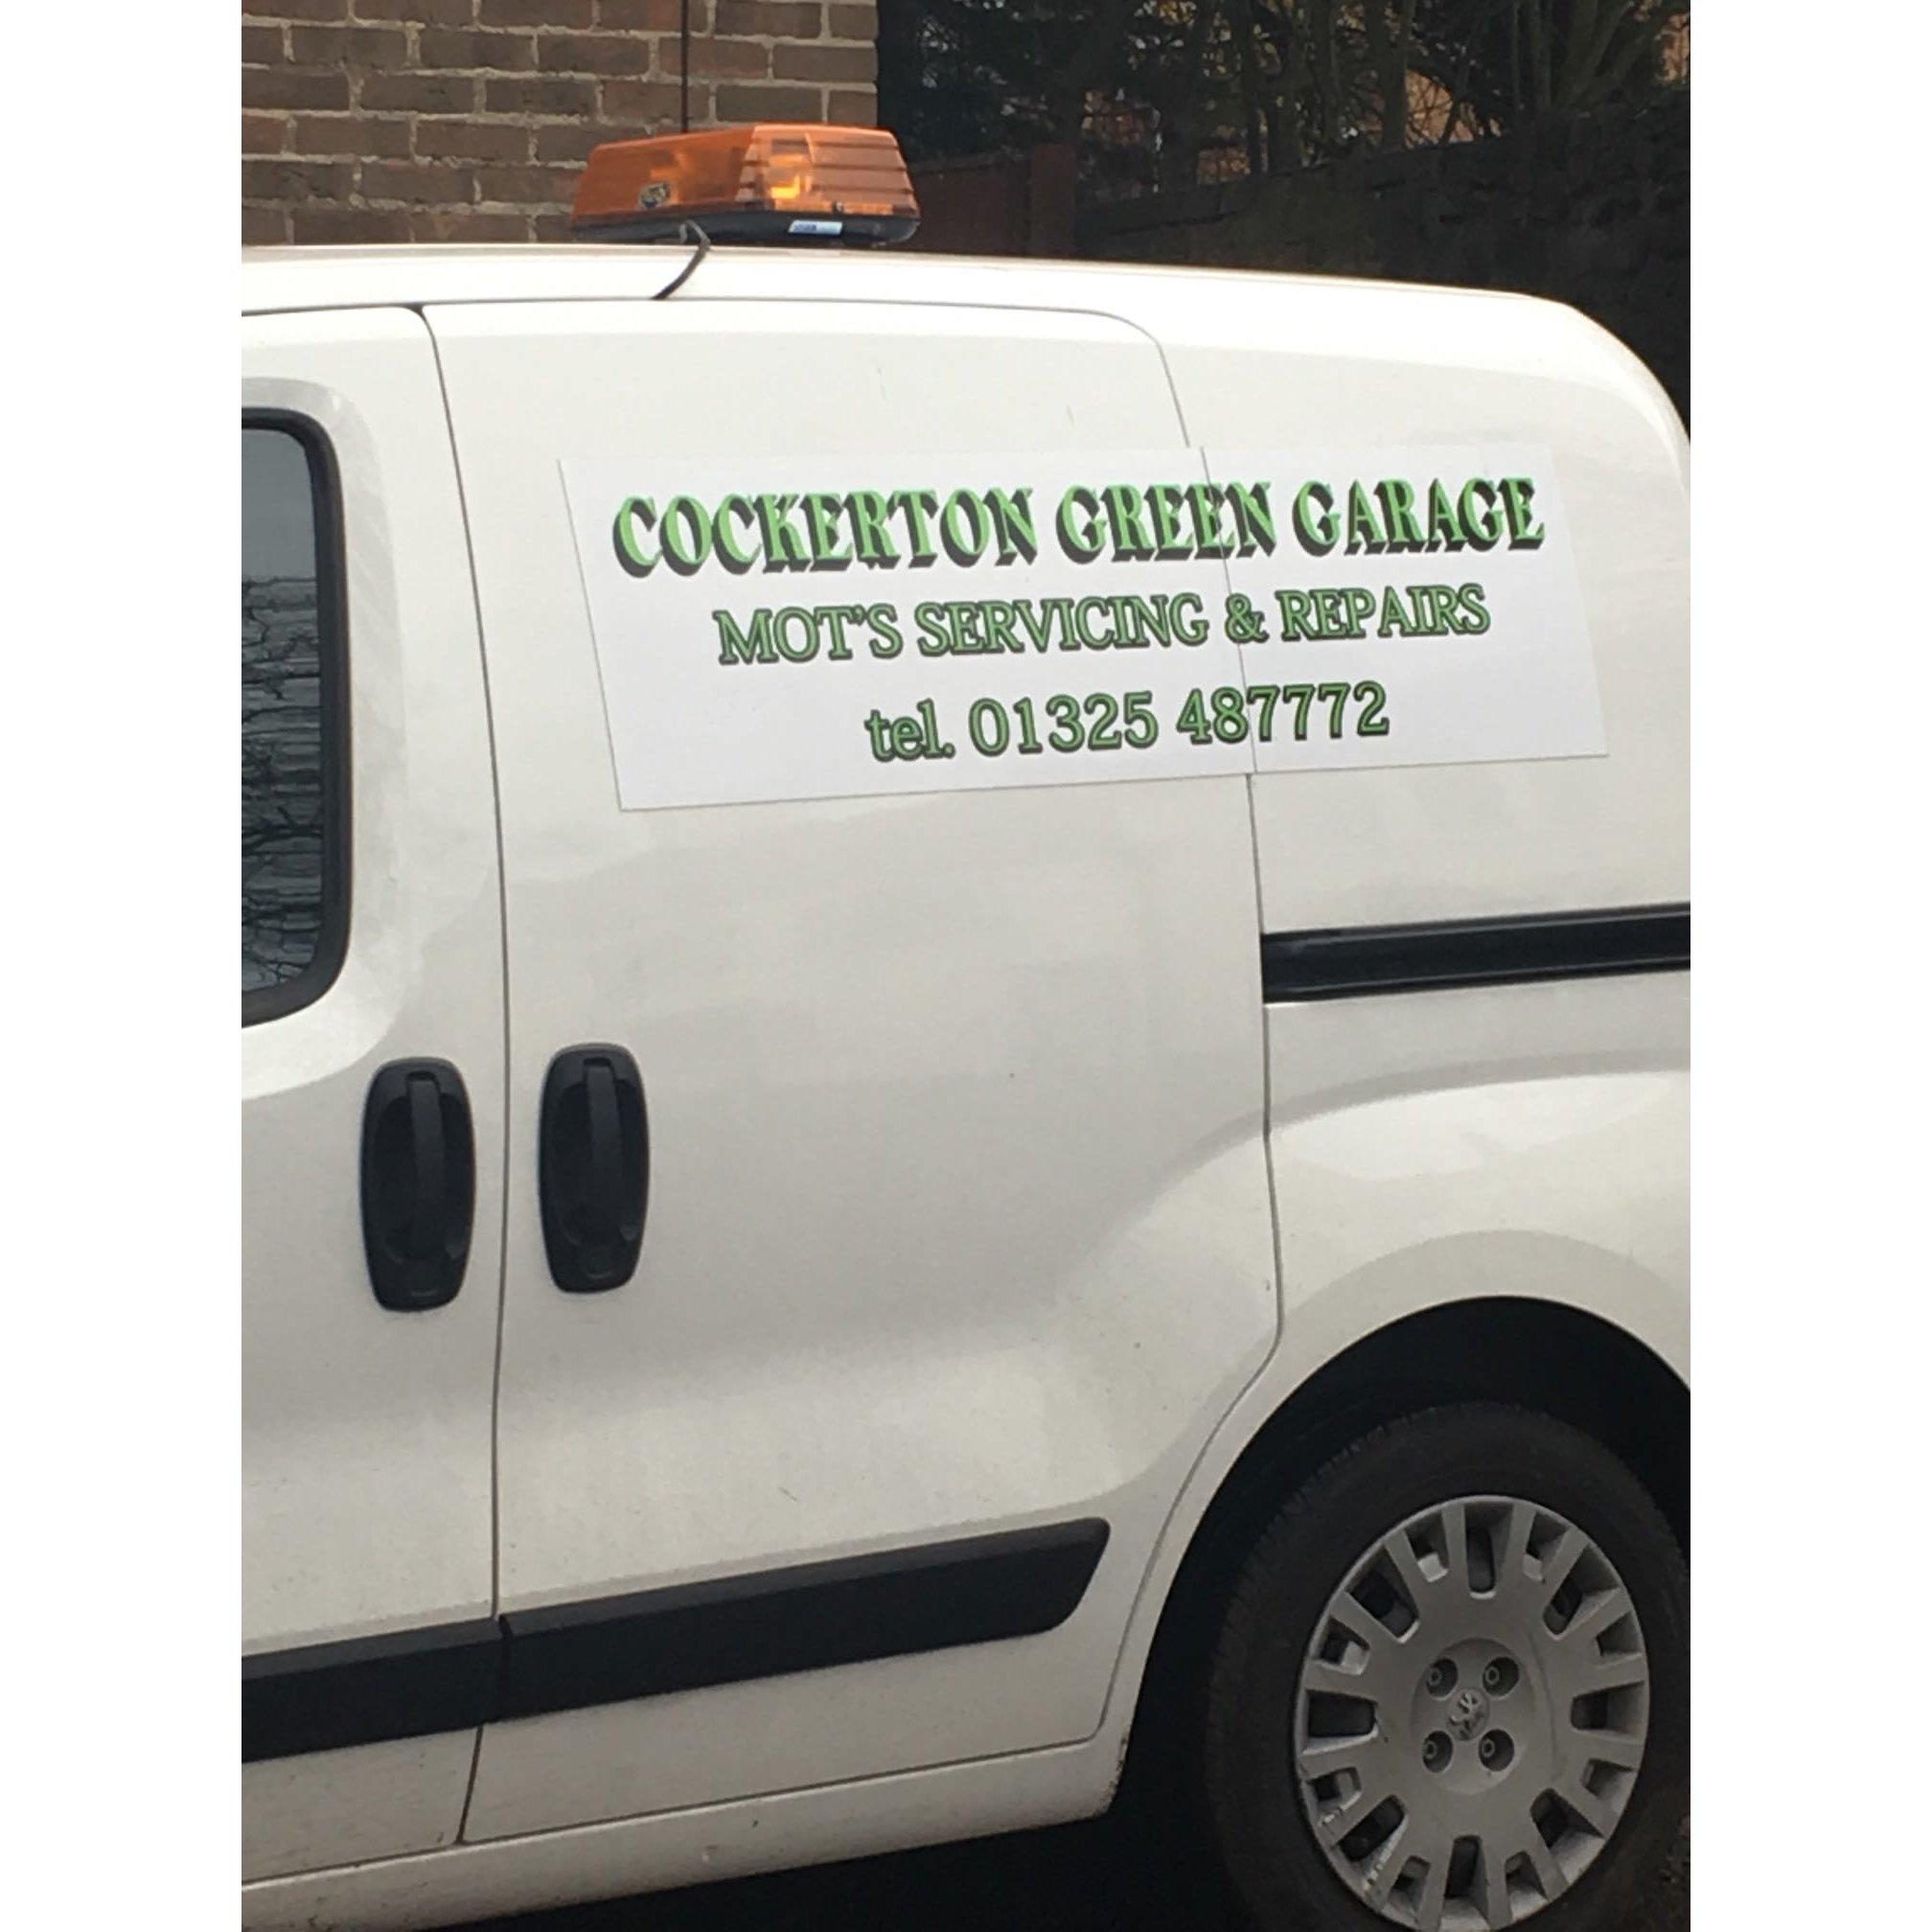 Cockerton Green Garage - Darlington, Durham DL3 9EG - 01325 487772 | ShowMeLocal.com